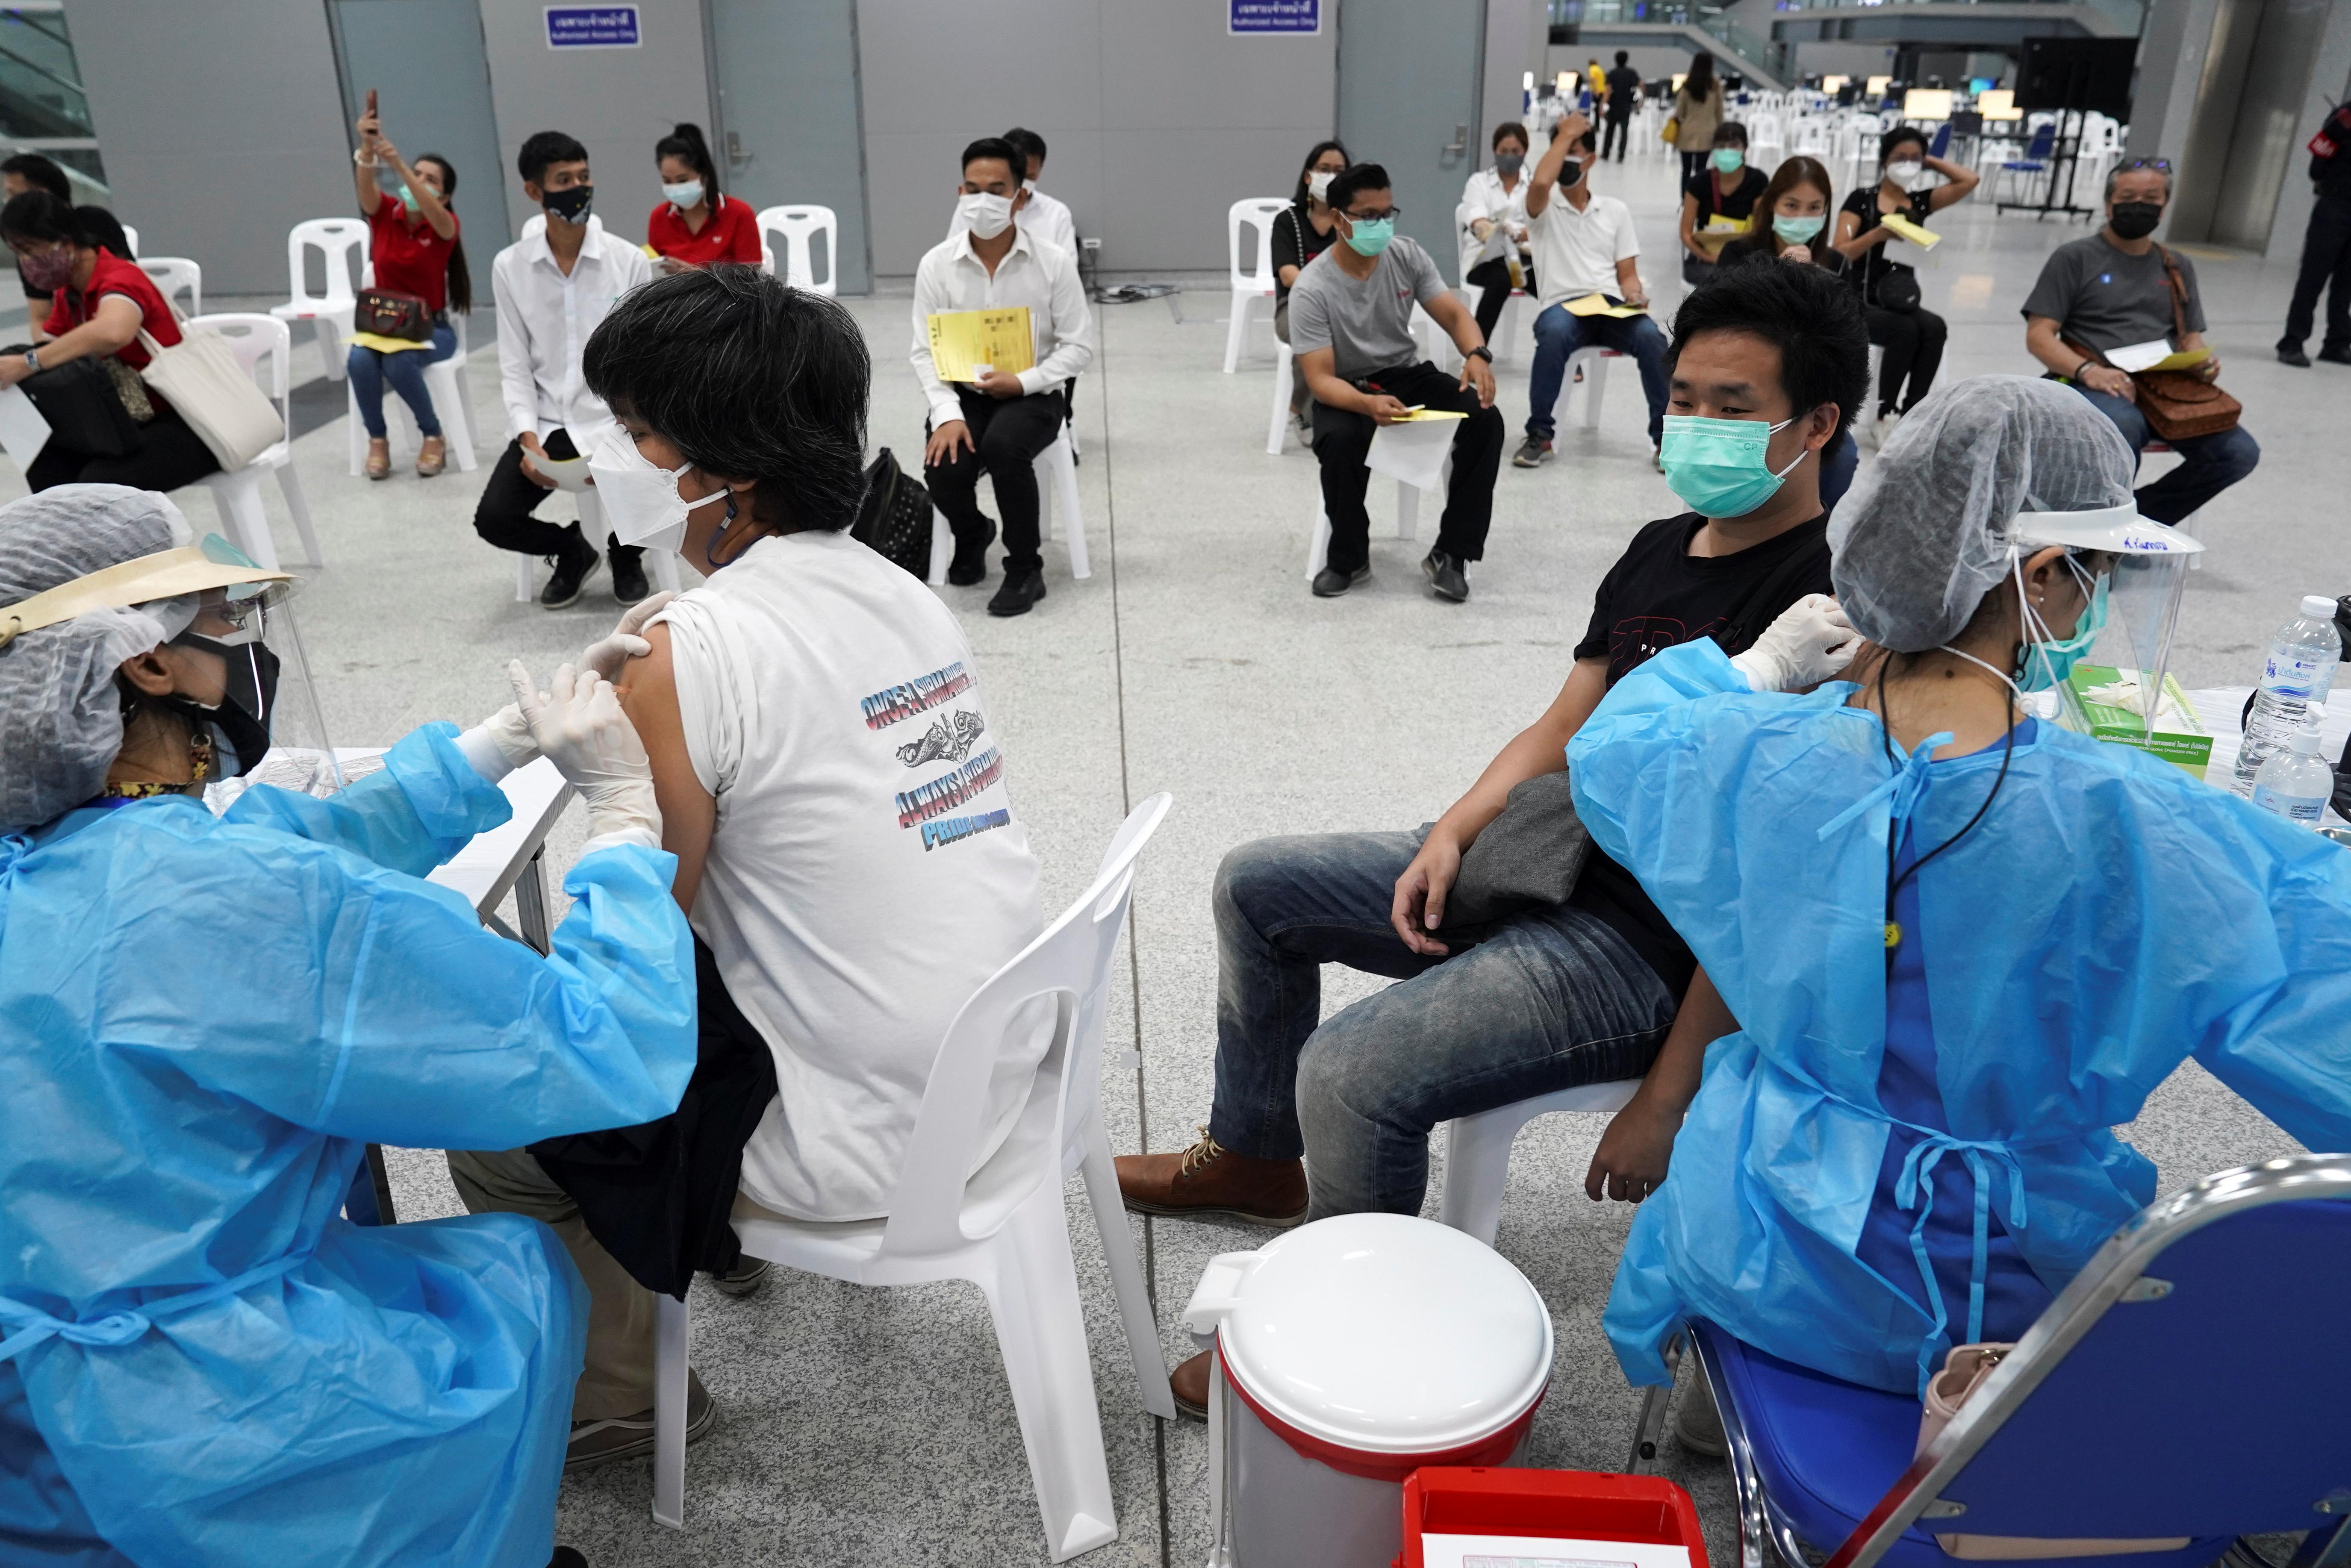 People receive China's Sinovac coronavirus disease (COVID-19) vaccine at the Central Vaccination Center, inside the Bang Sue Grand Station, in Bangkok, Thailand, May 24, 2021. REUTERS/Athit Perawongmetha